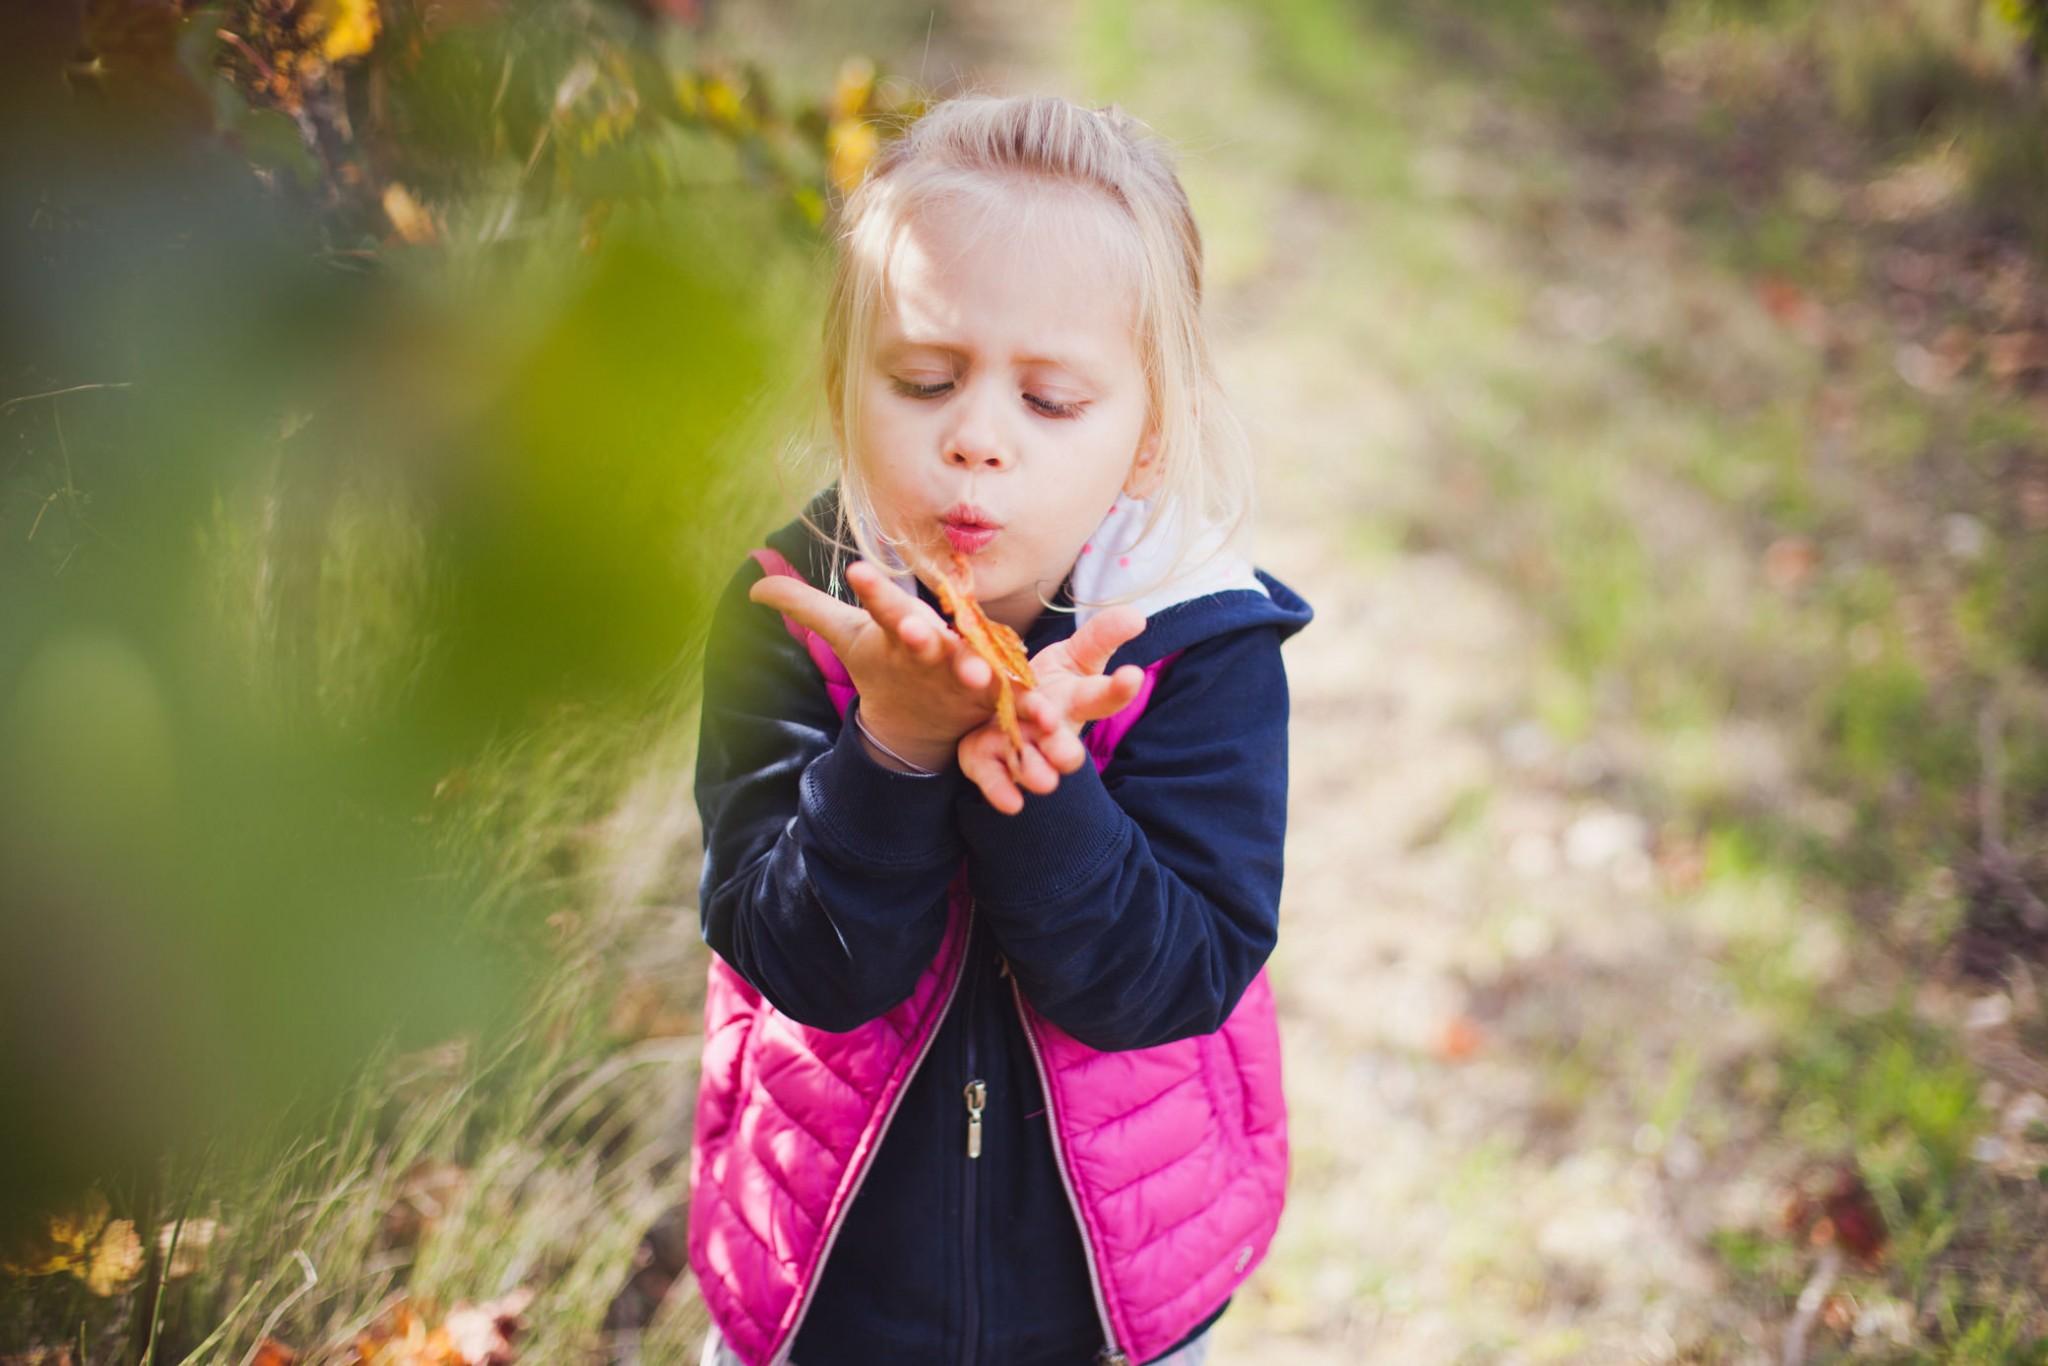 petite-fille-souffle-feuille-automne